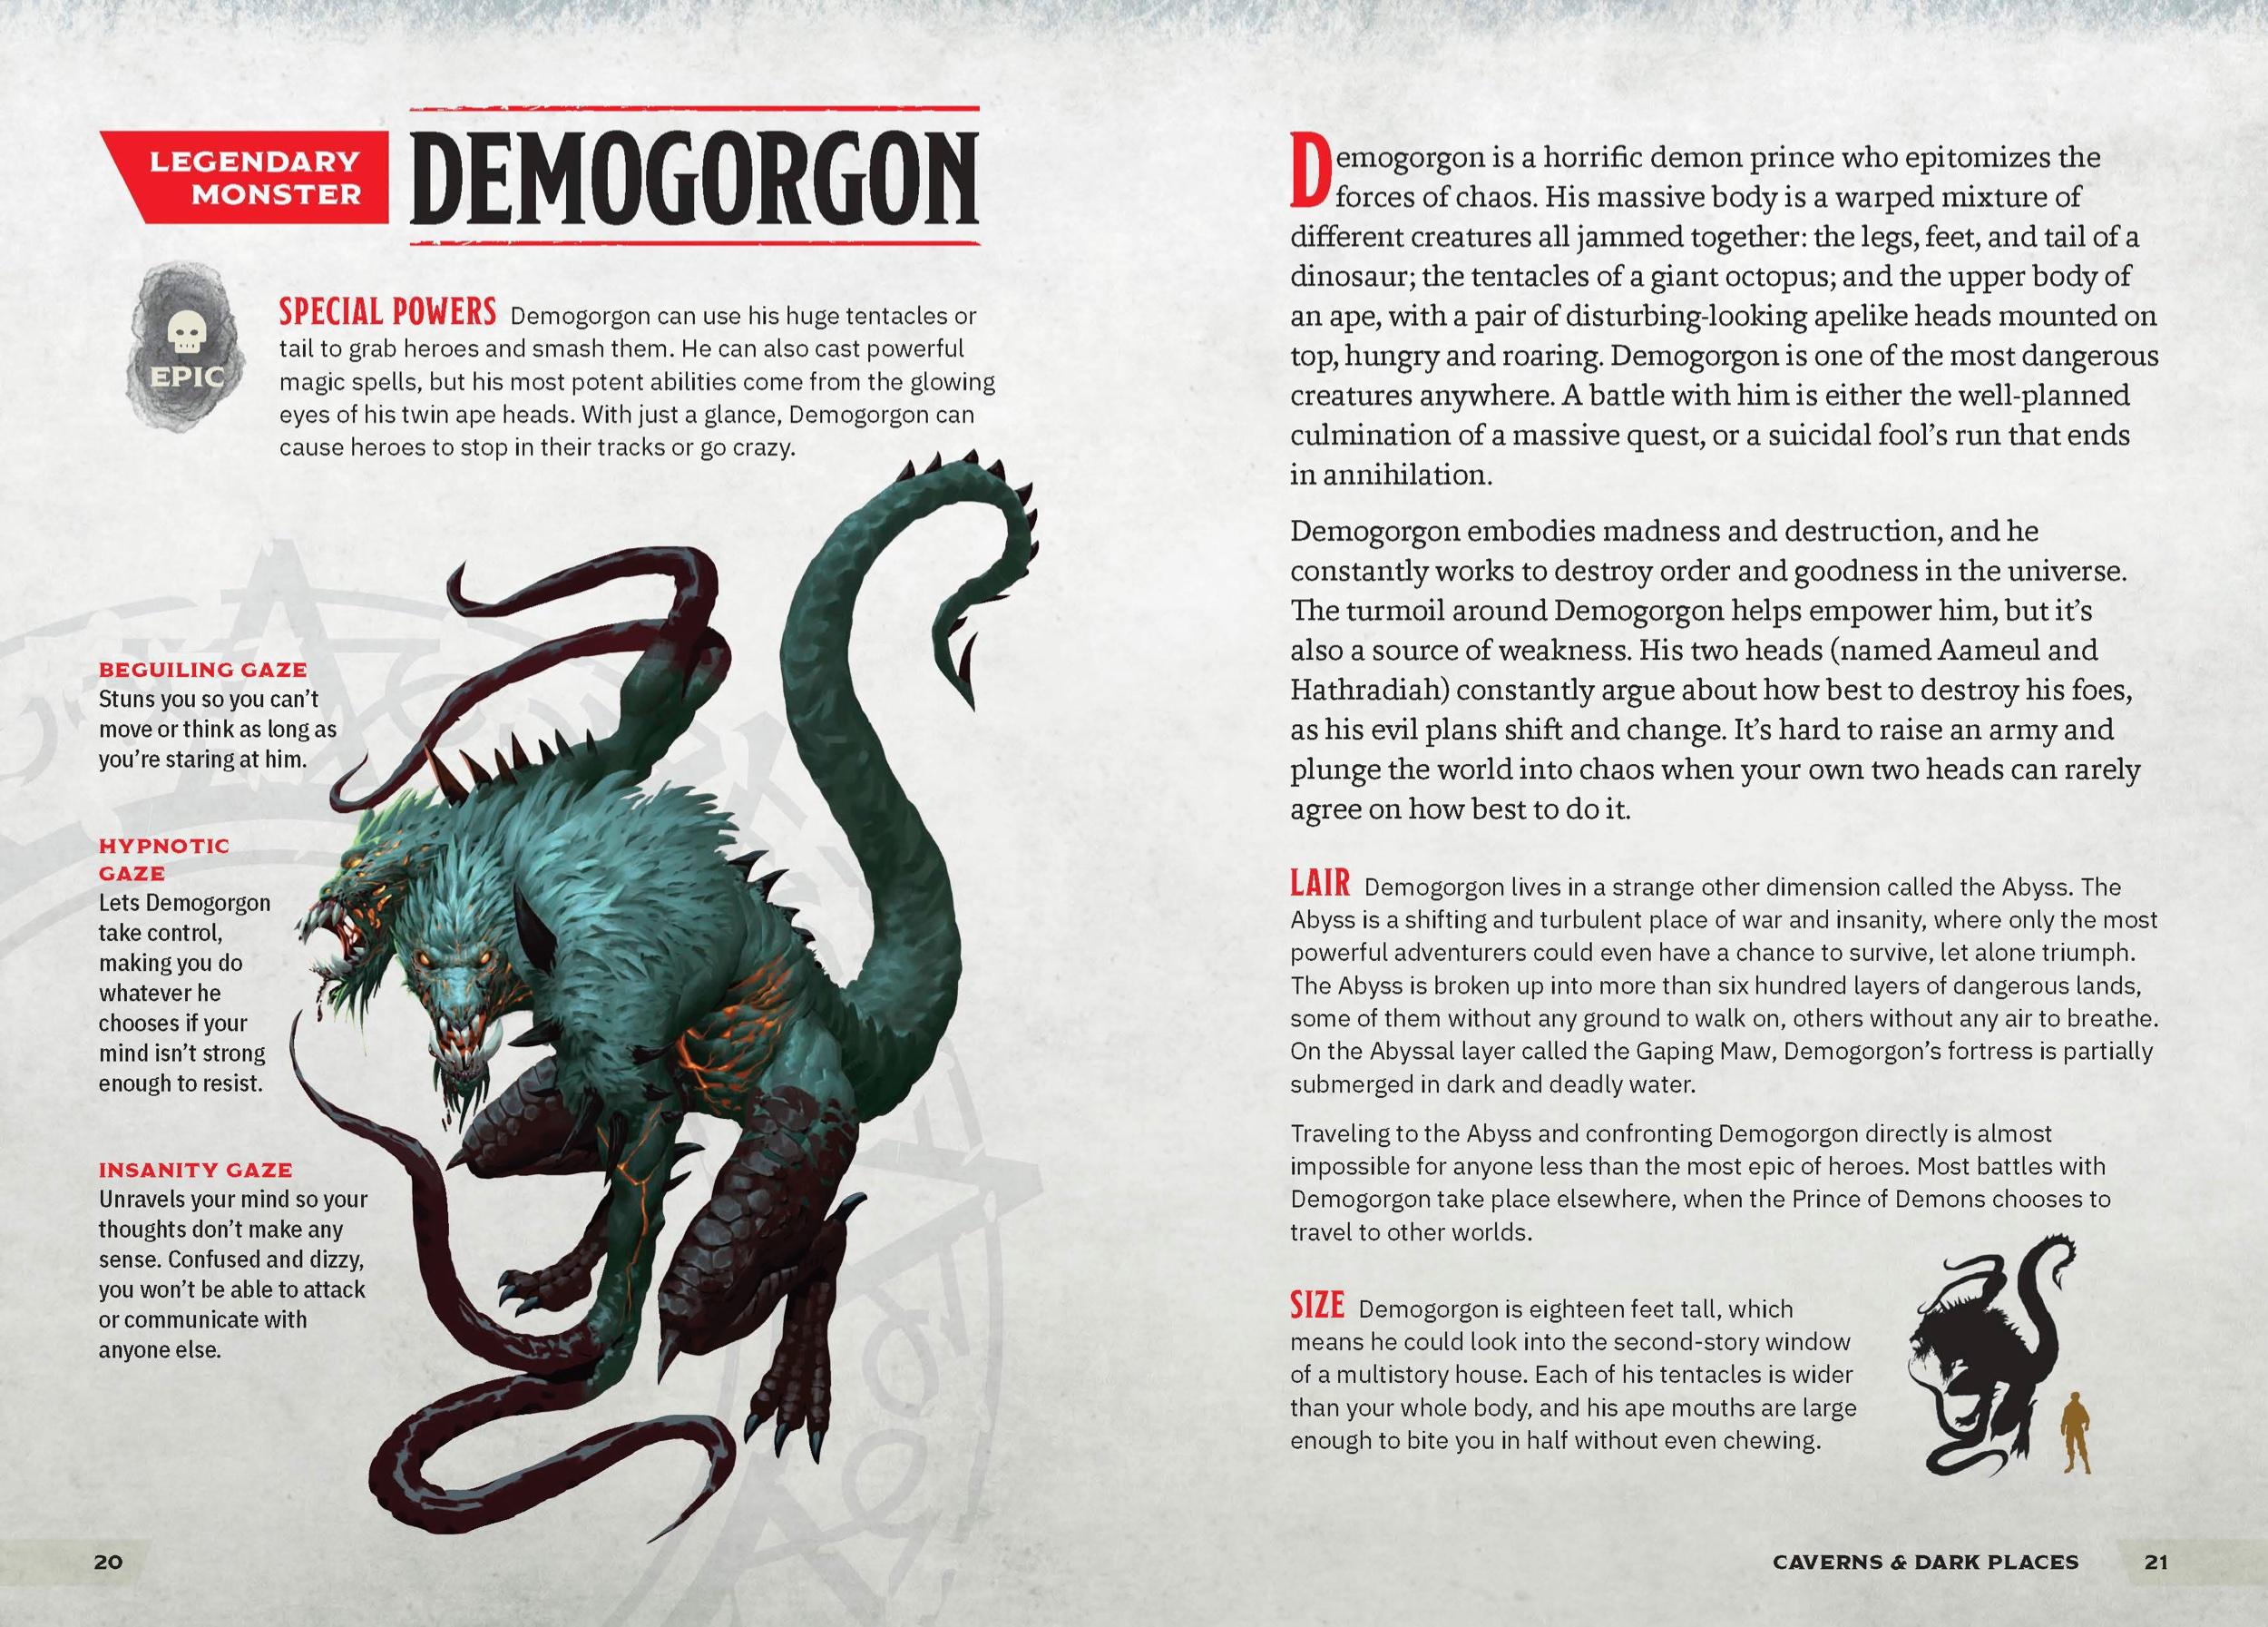 Monsters - Demogorgon.jpeg